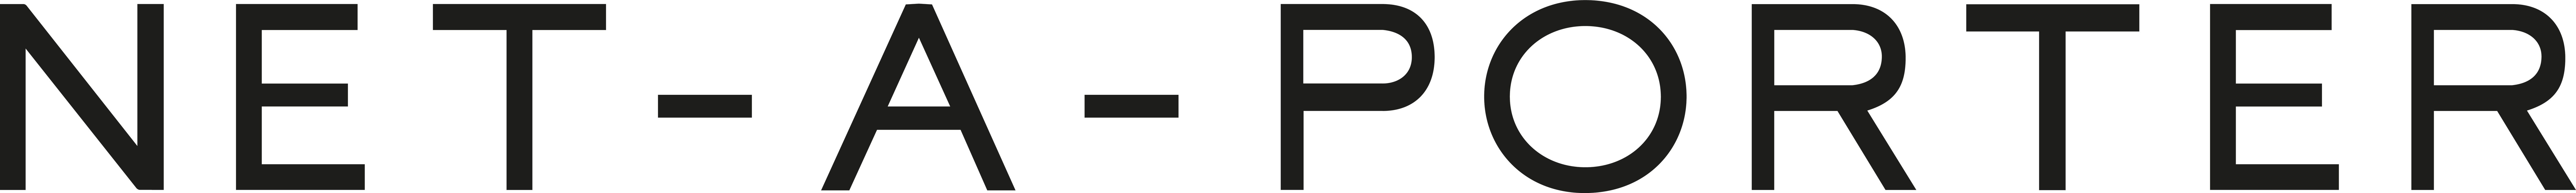 net a porter logo